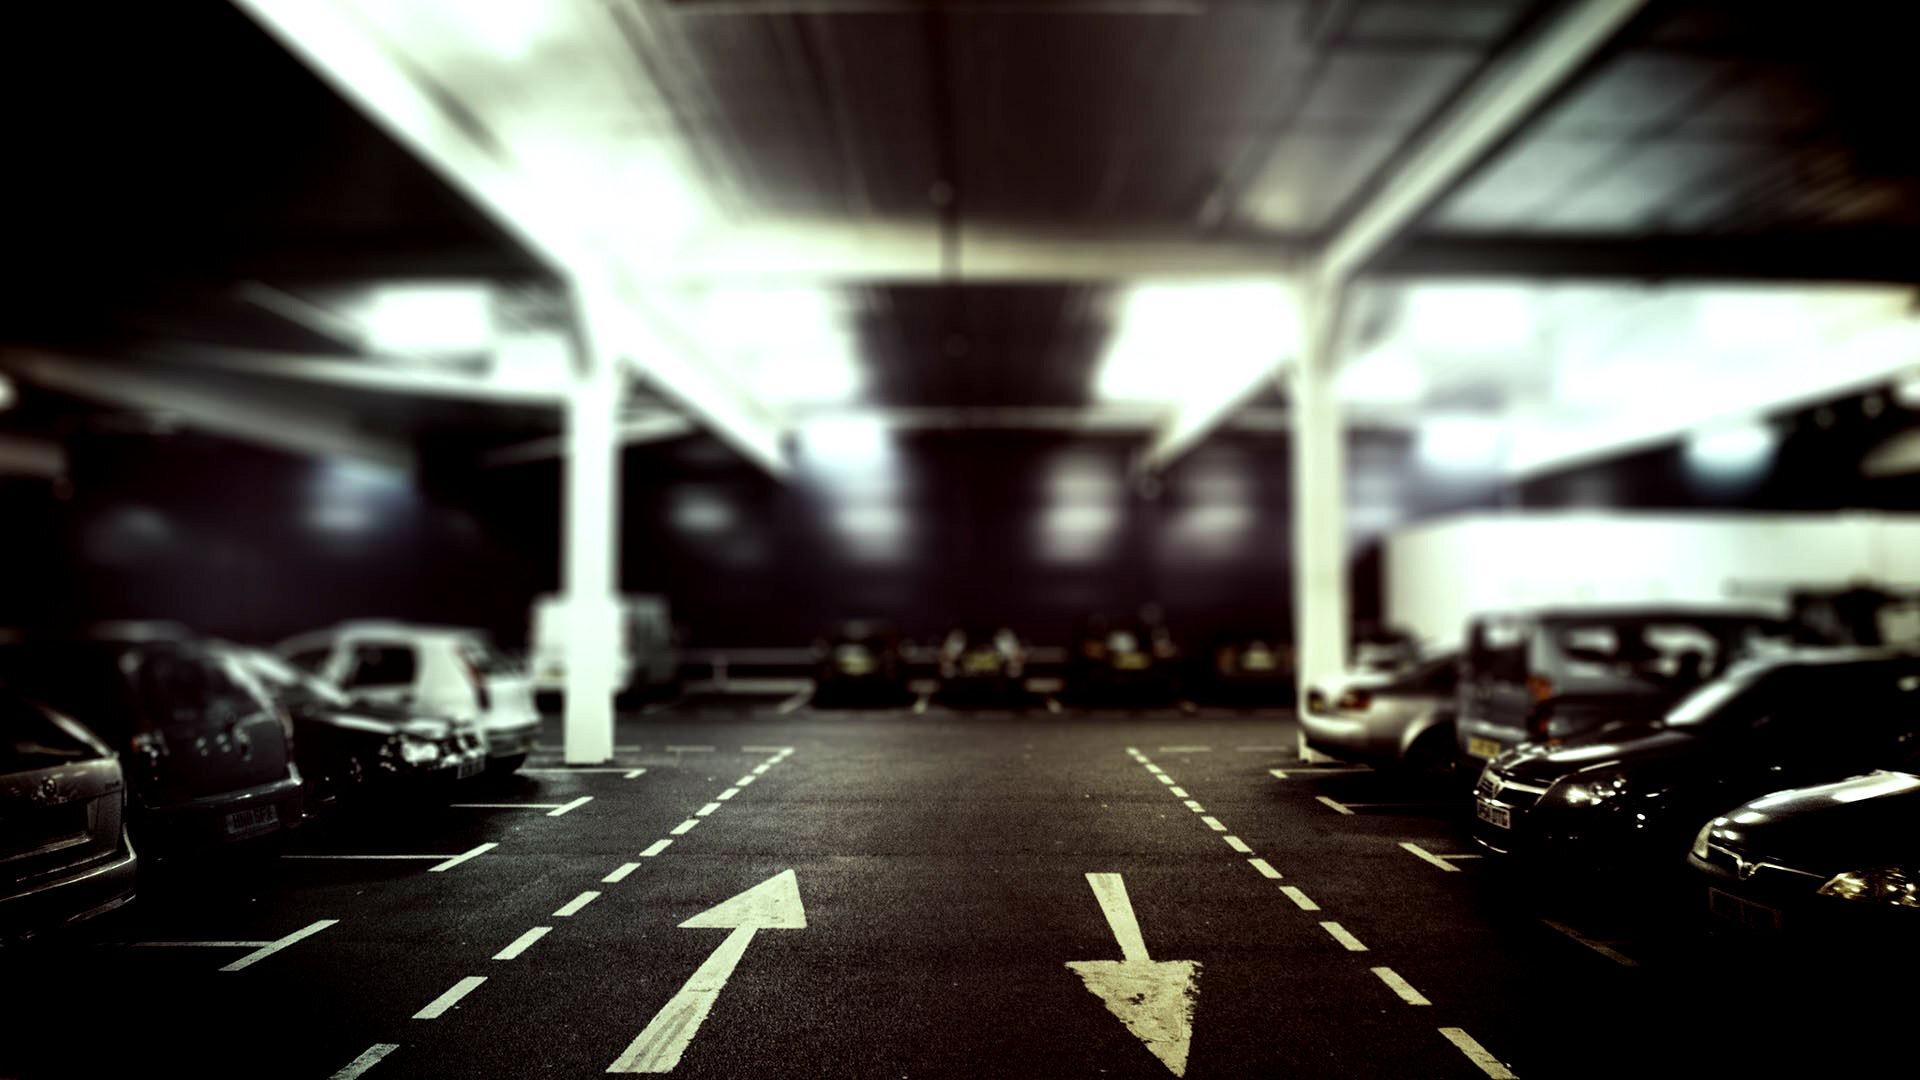 Car Wallpaper App For Android App Quot Let S Park Quot Ajuda A Encontrar Estacionamentos Em S 227 O